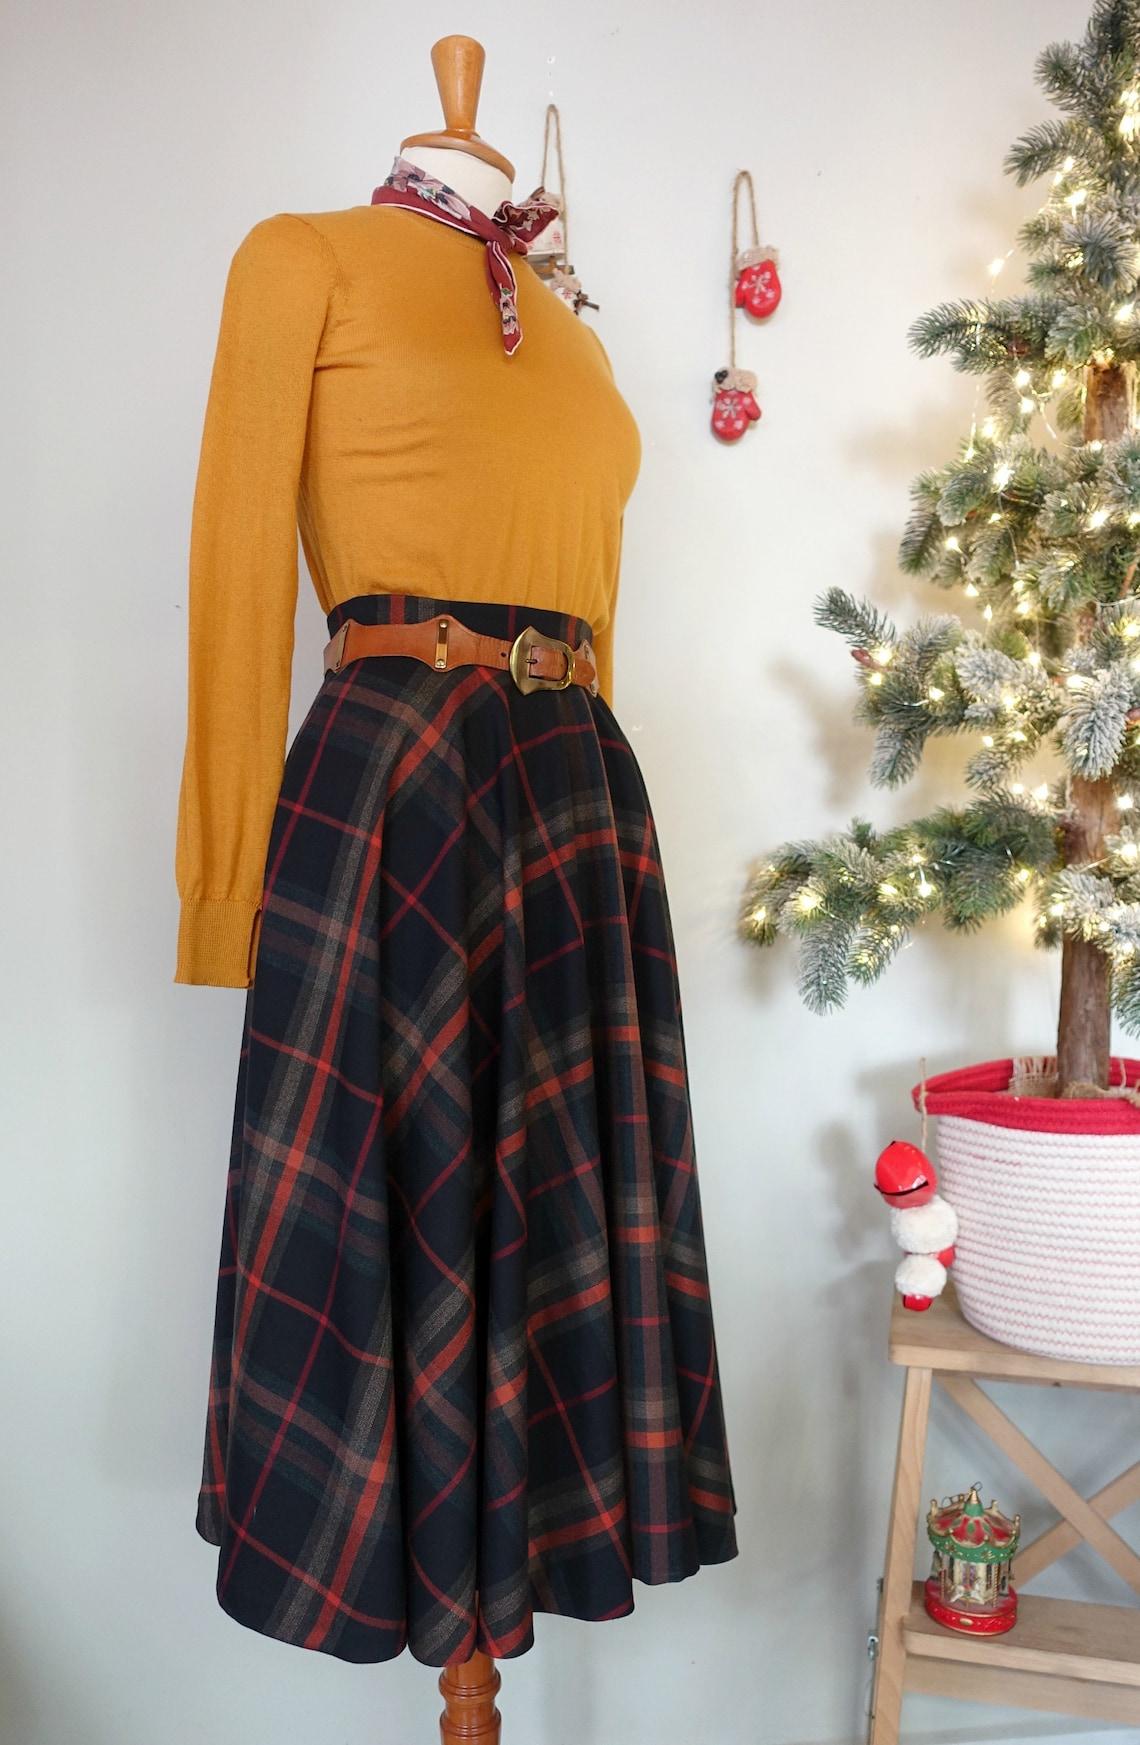 1950s Swing Skirt, Poodle Skirt, Pencil Skirts Swell Dame Custom made plaid circle flannel skirt $95.95 AT vintagedancer.com